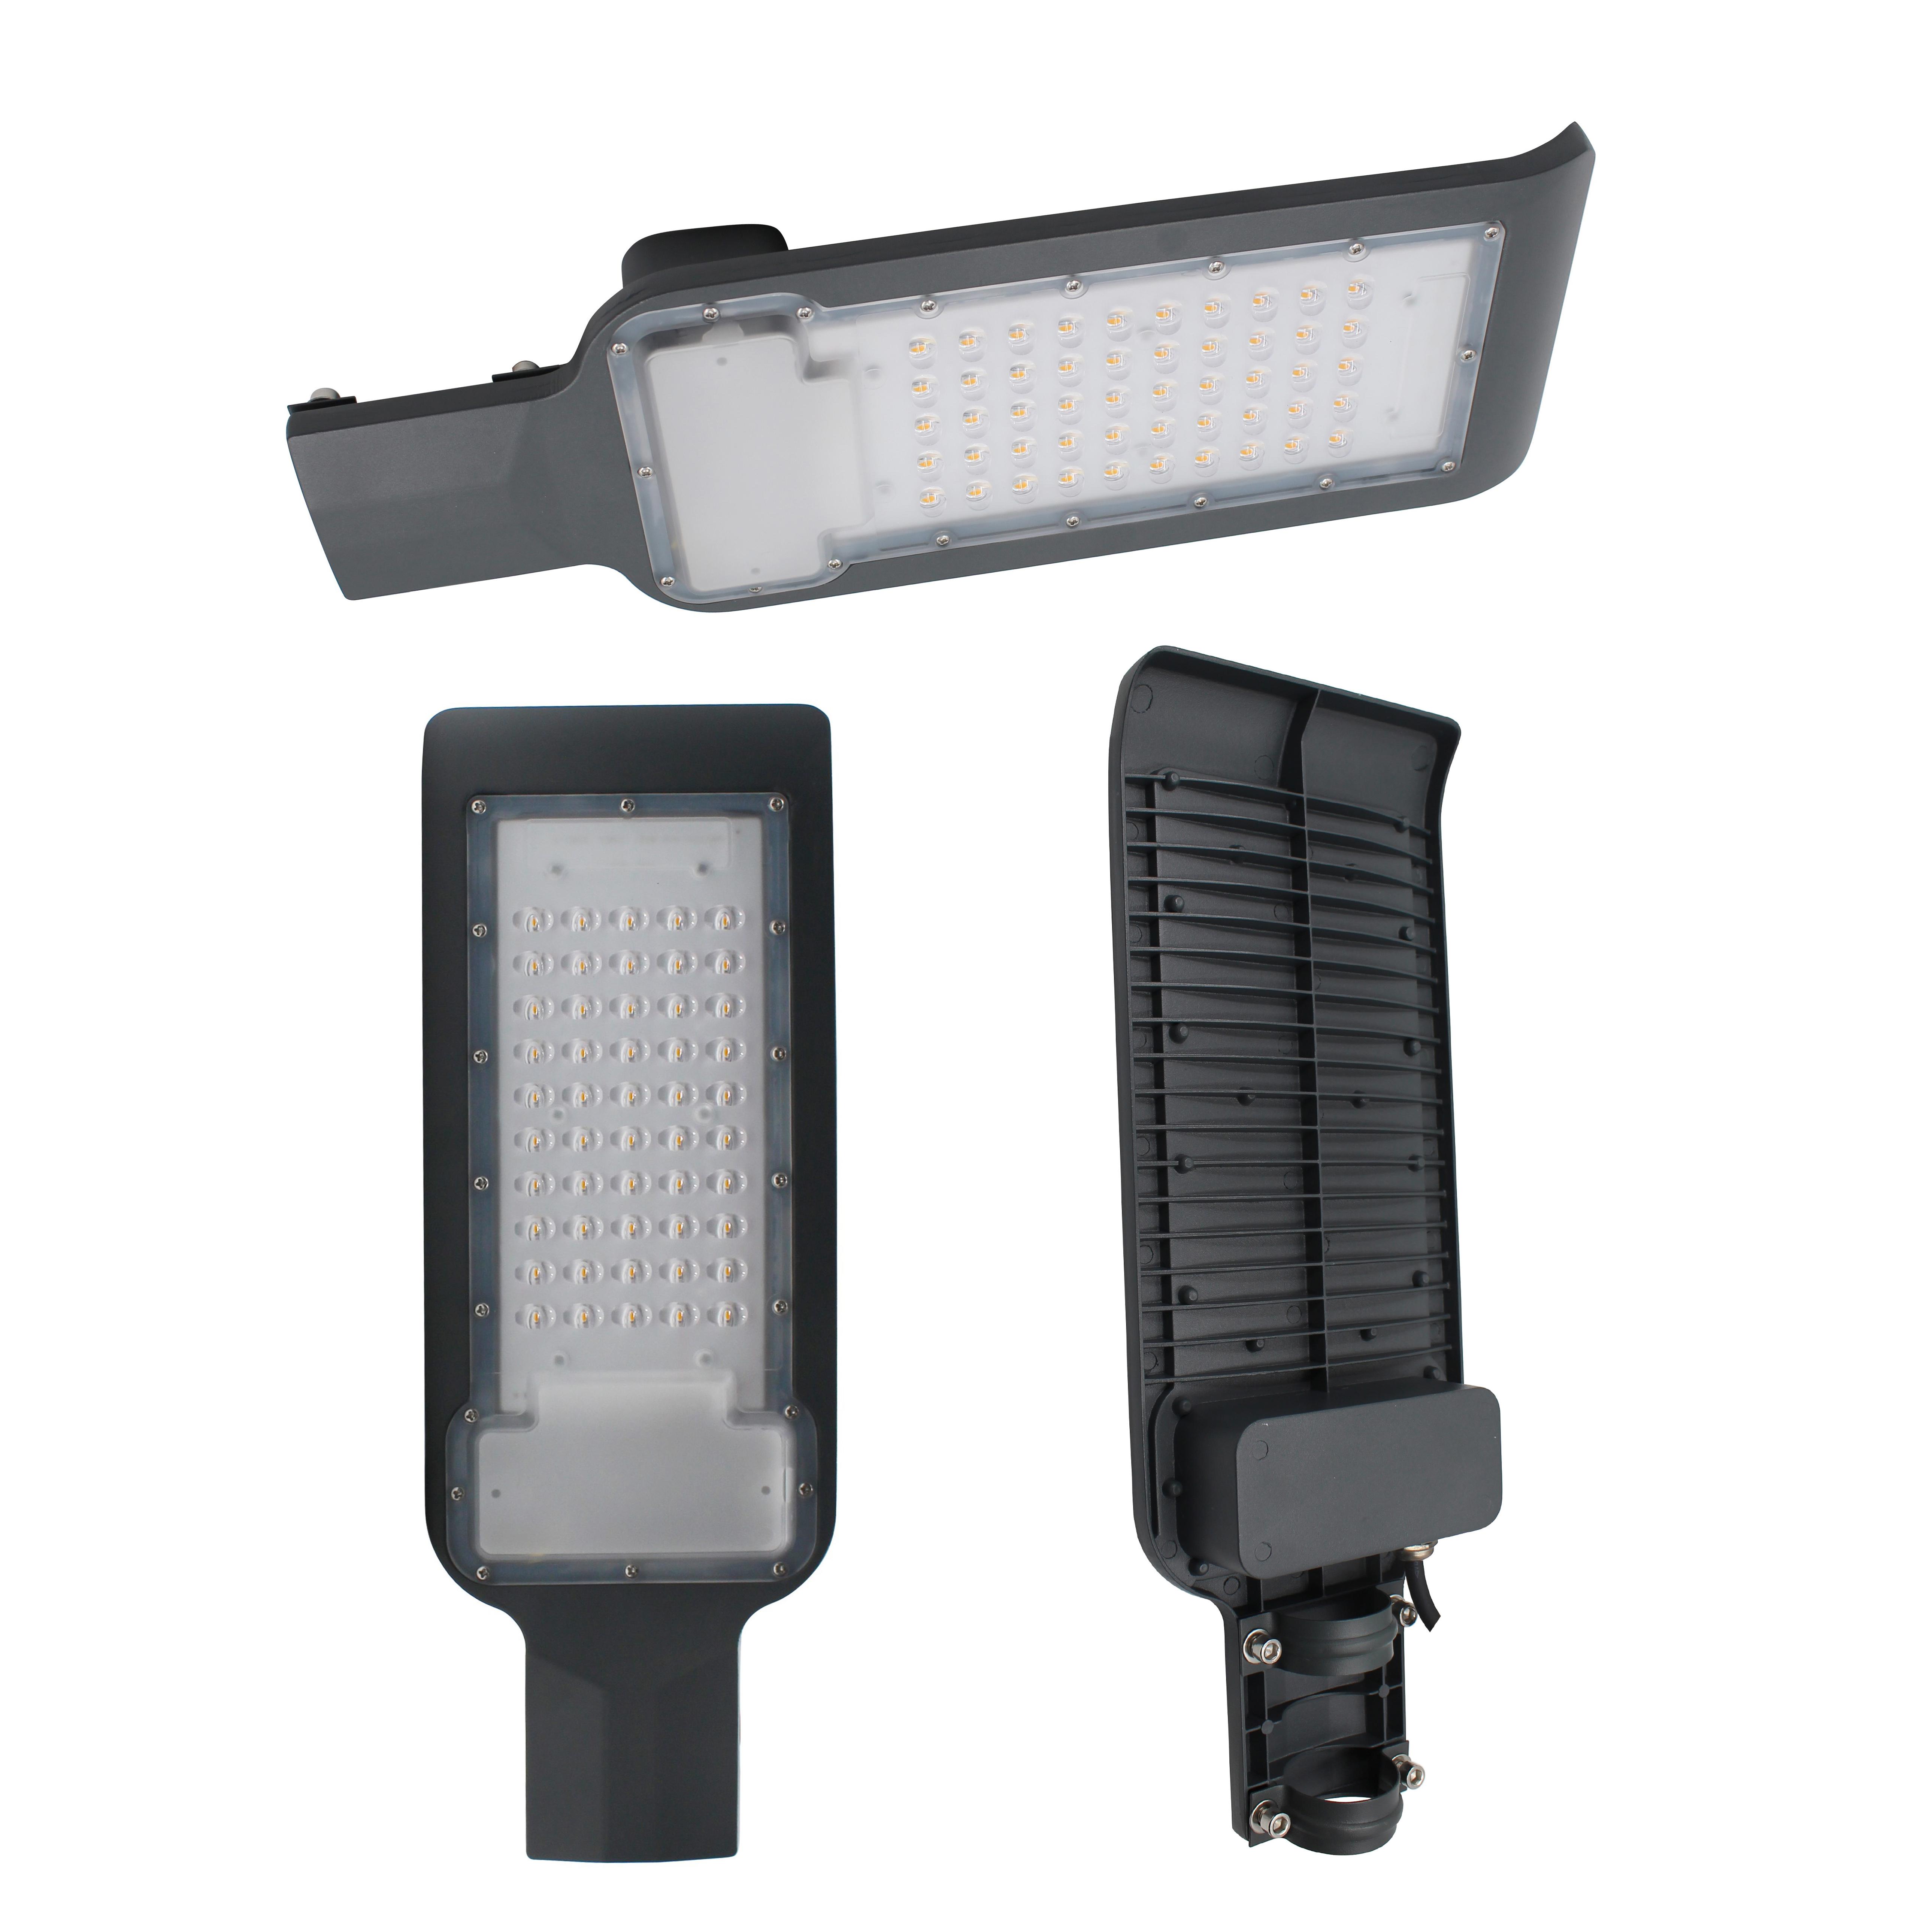 Popular outdoor road led lighting products 100 Watt led street light street light price list